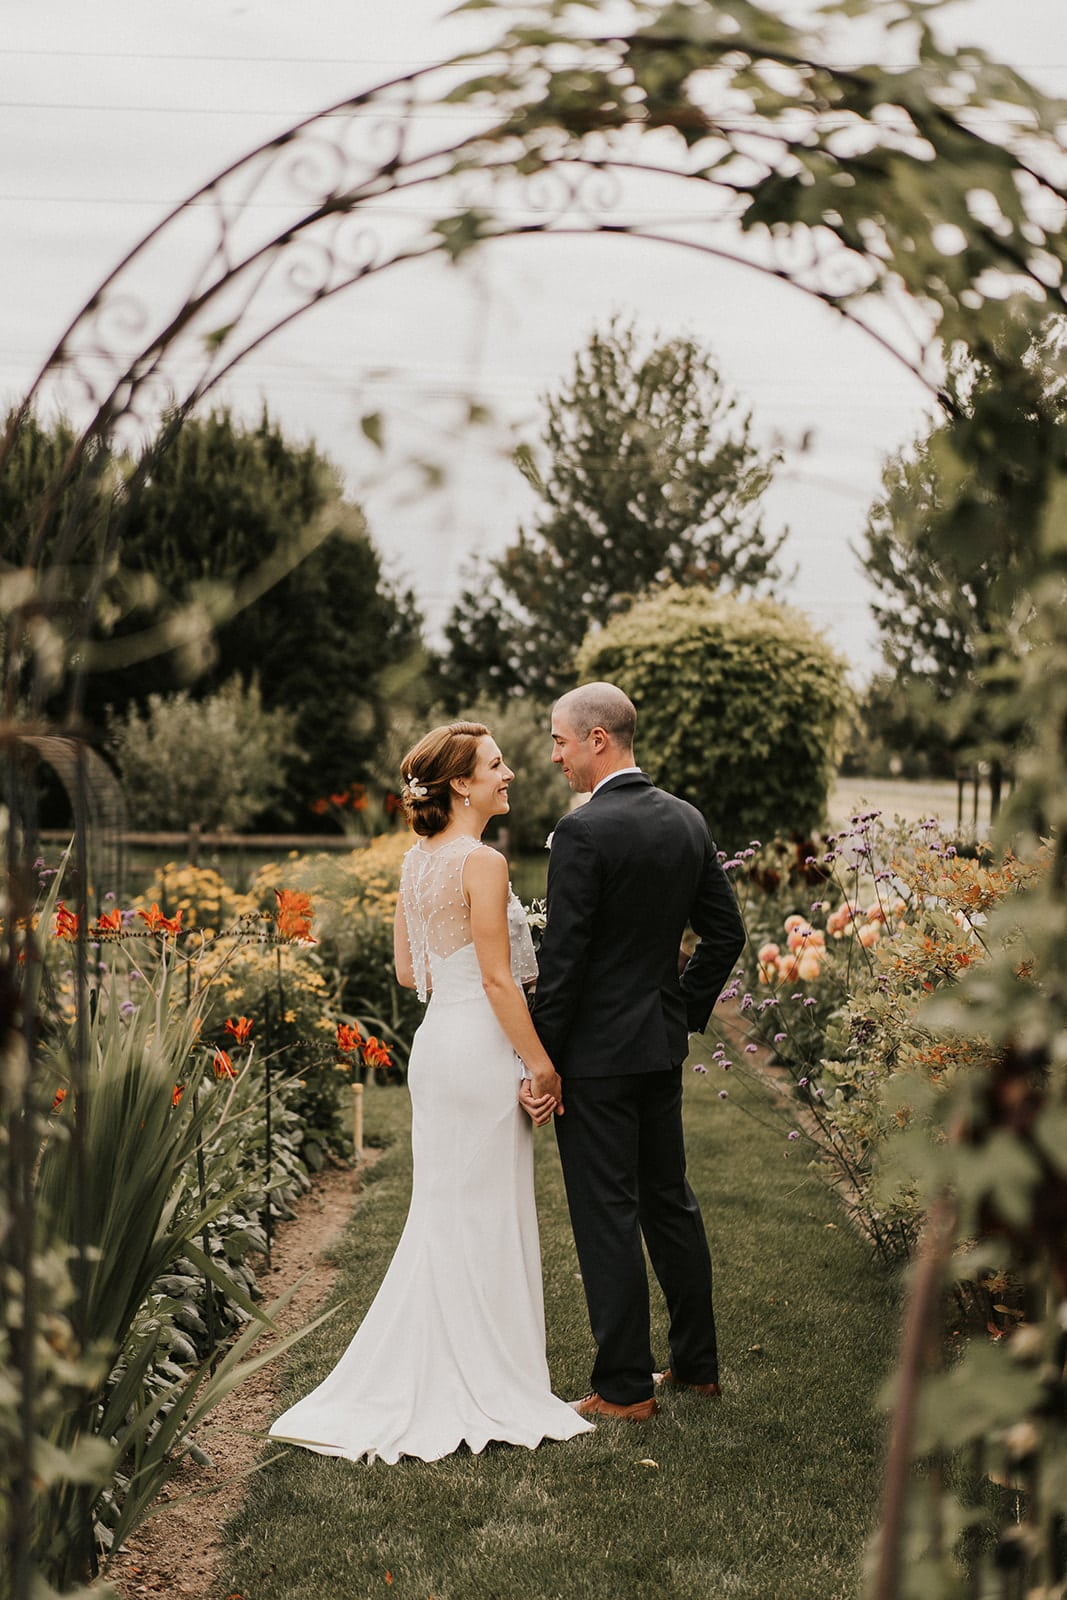 bride and groom taking photos in garden of flowers